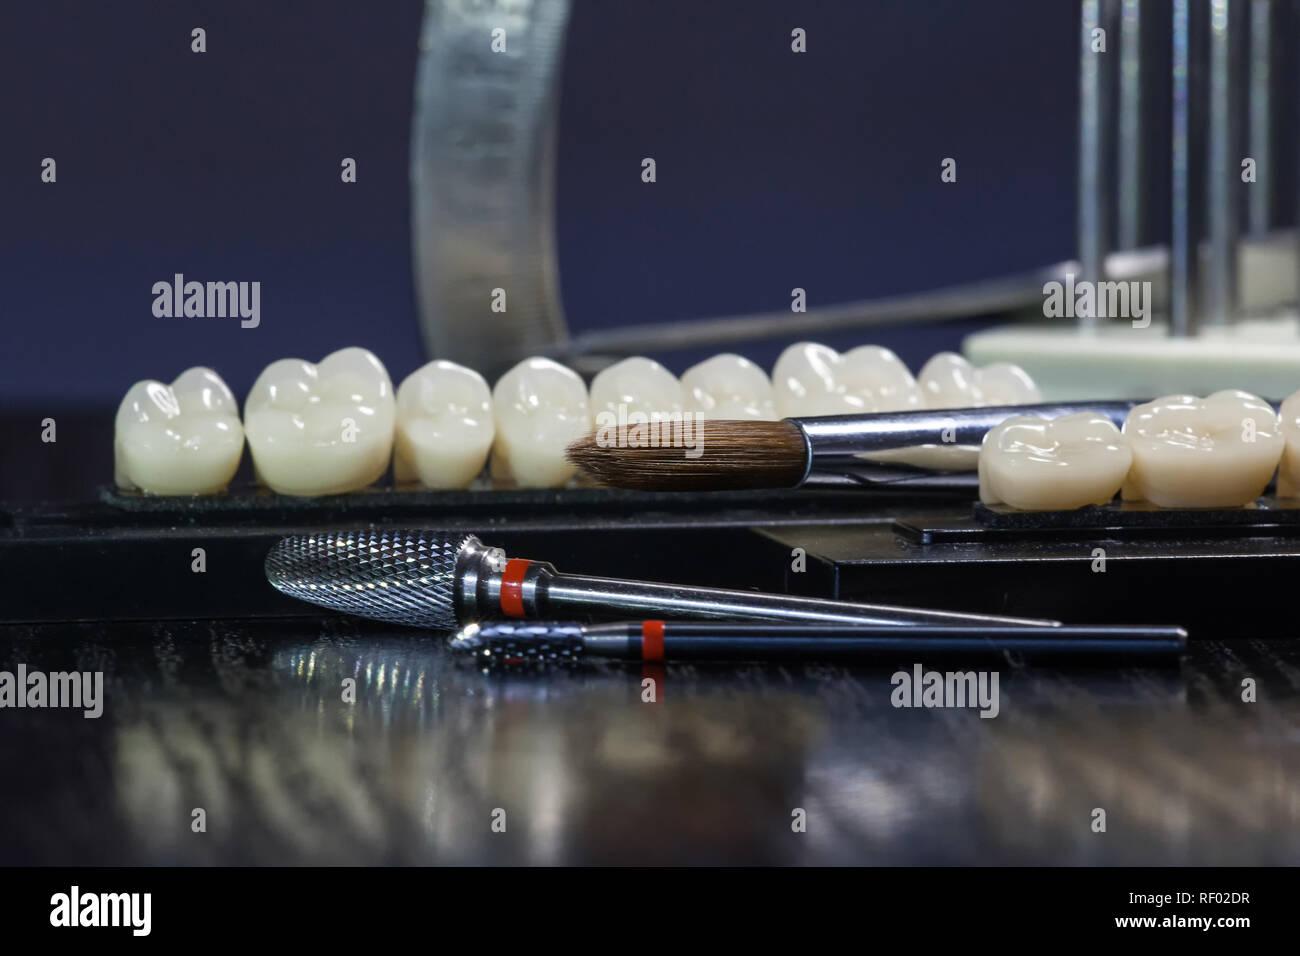 Acrylic teeth and dental instruments. Stomatologic instrument, close up view - Stock Image